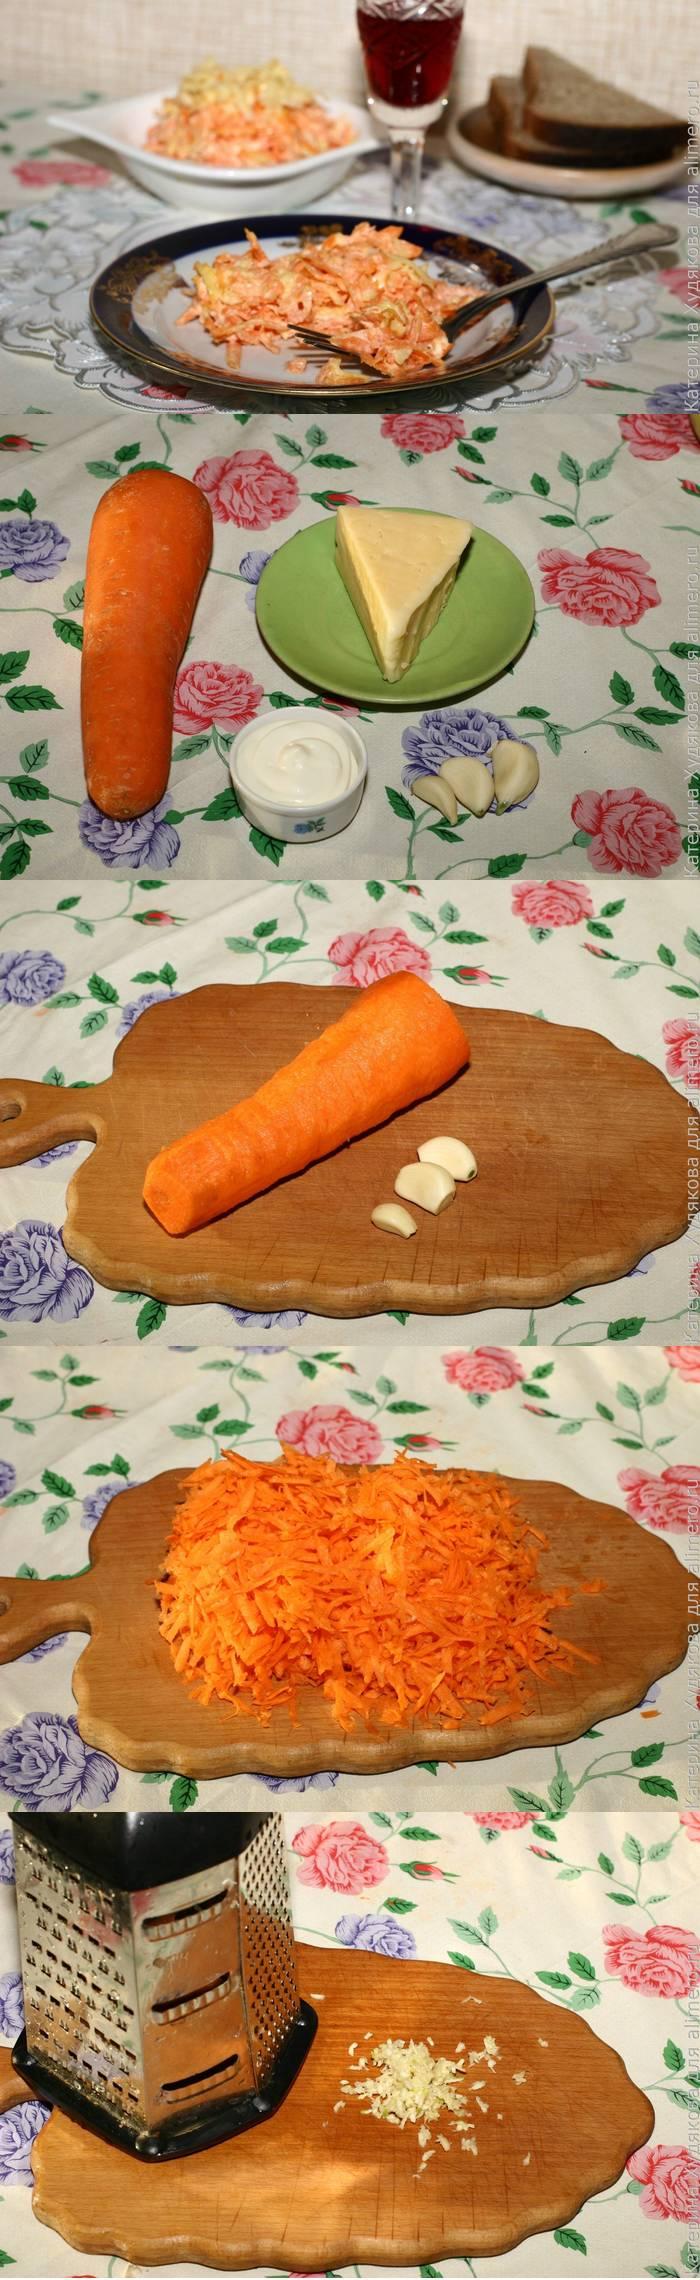 "Морковный салат ""Супер быстрый"""